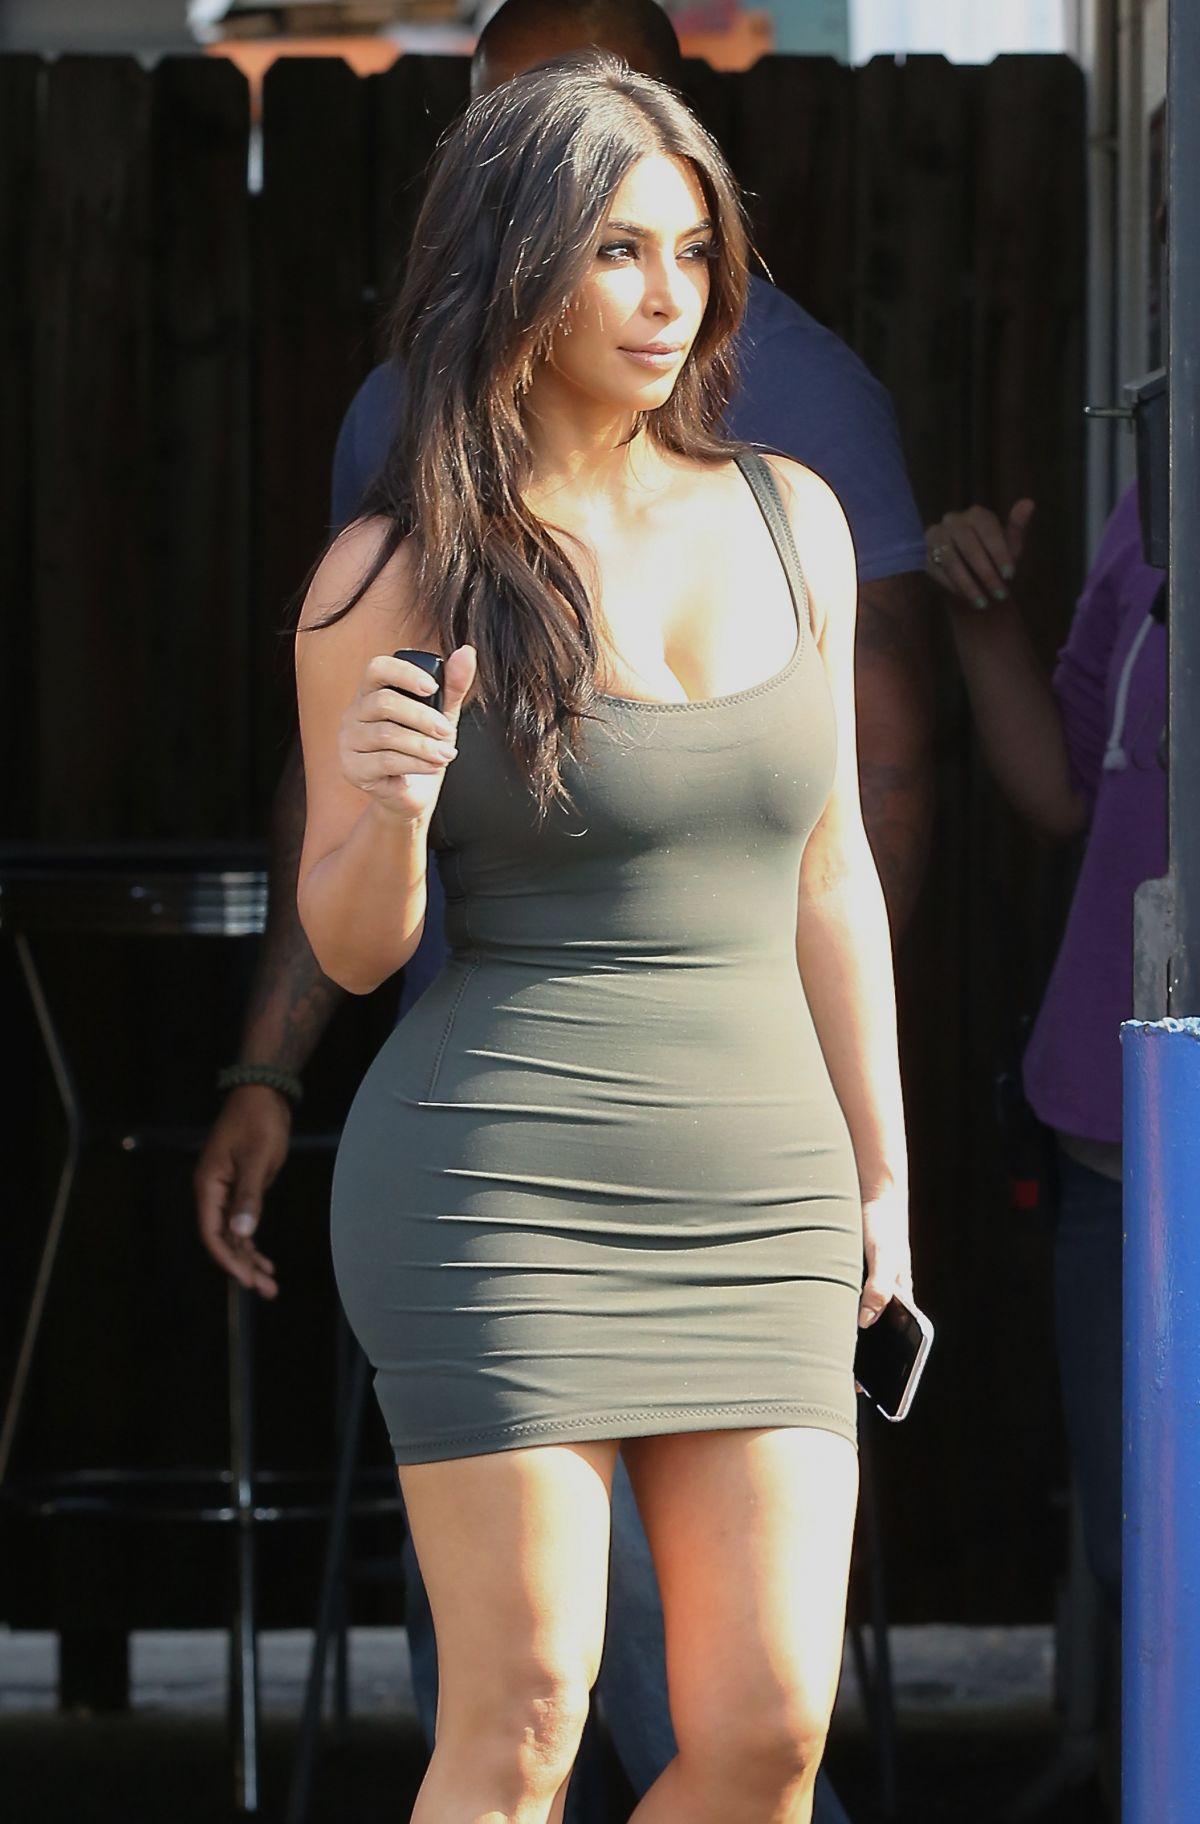 KIM KARDASHIAN in Tight Dress at a Studio in Van Nuys 06 ... Kim Kardashian